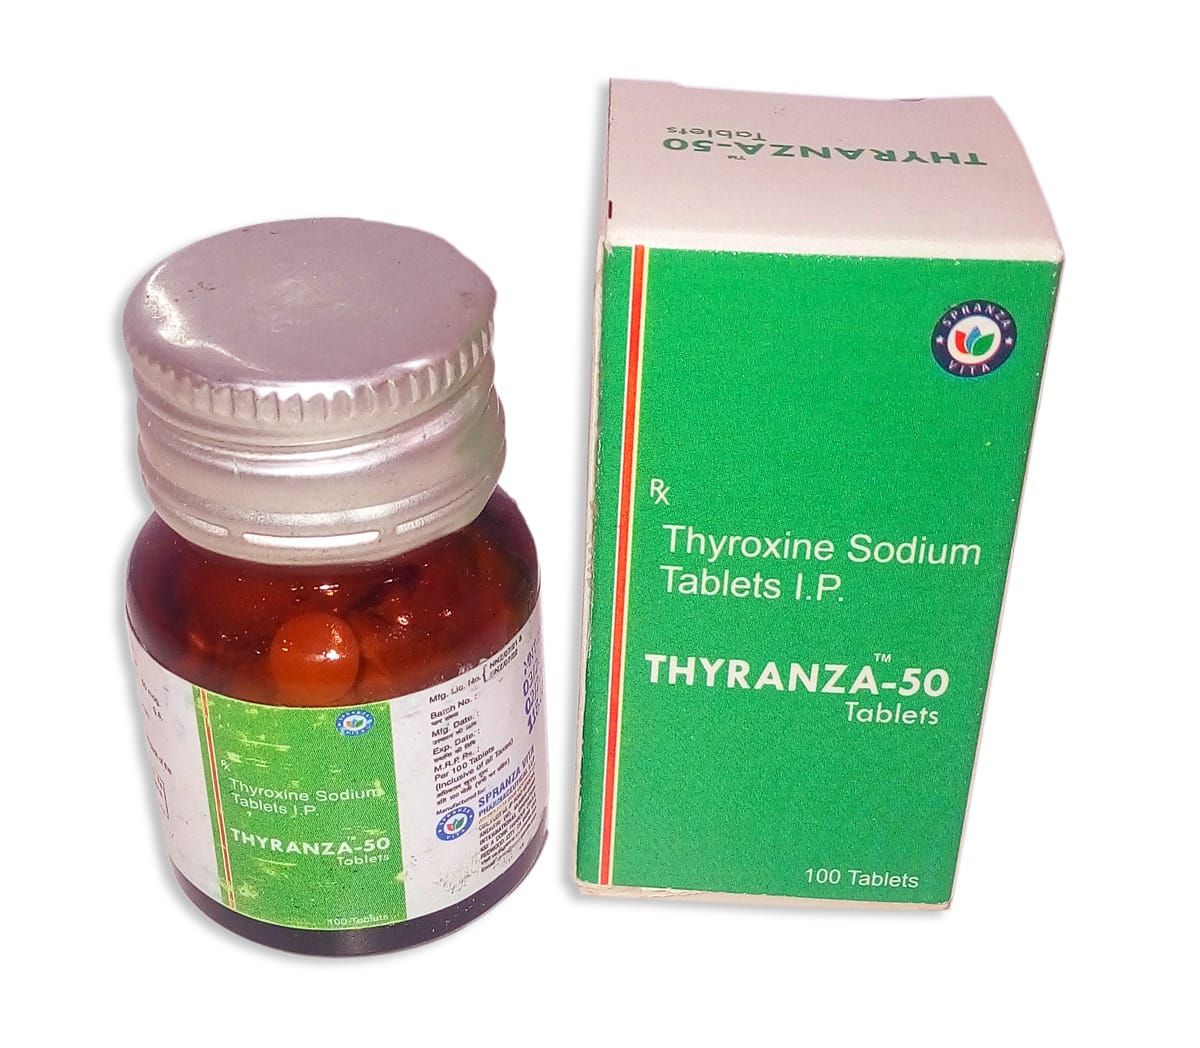 Thyranza 50 Spranza Vita Llp